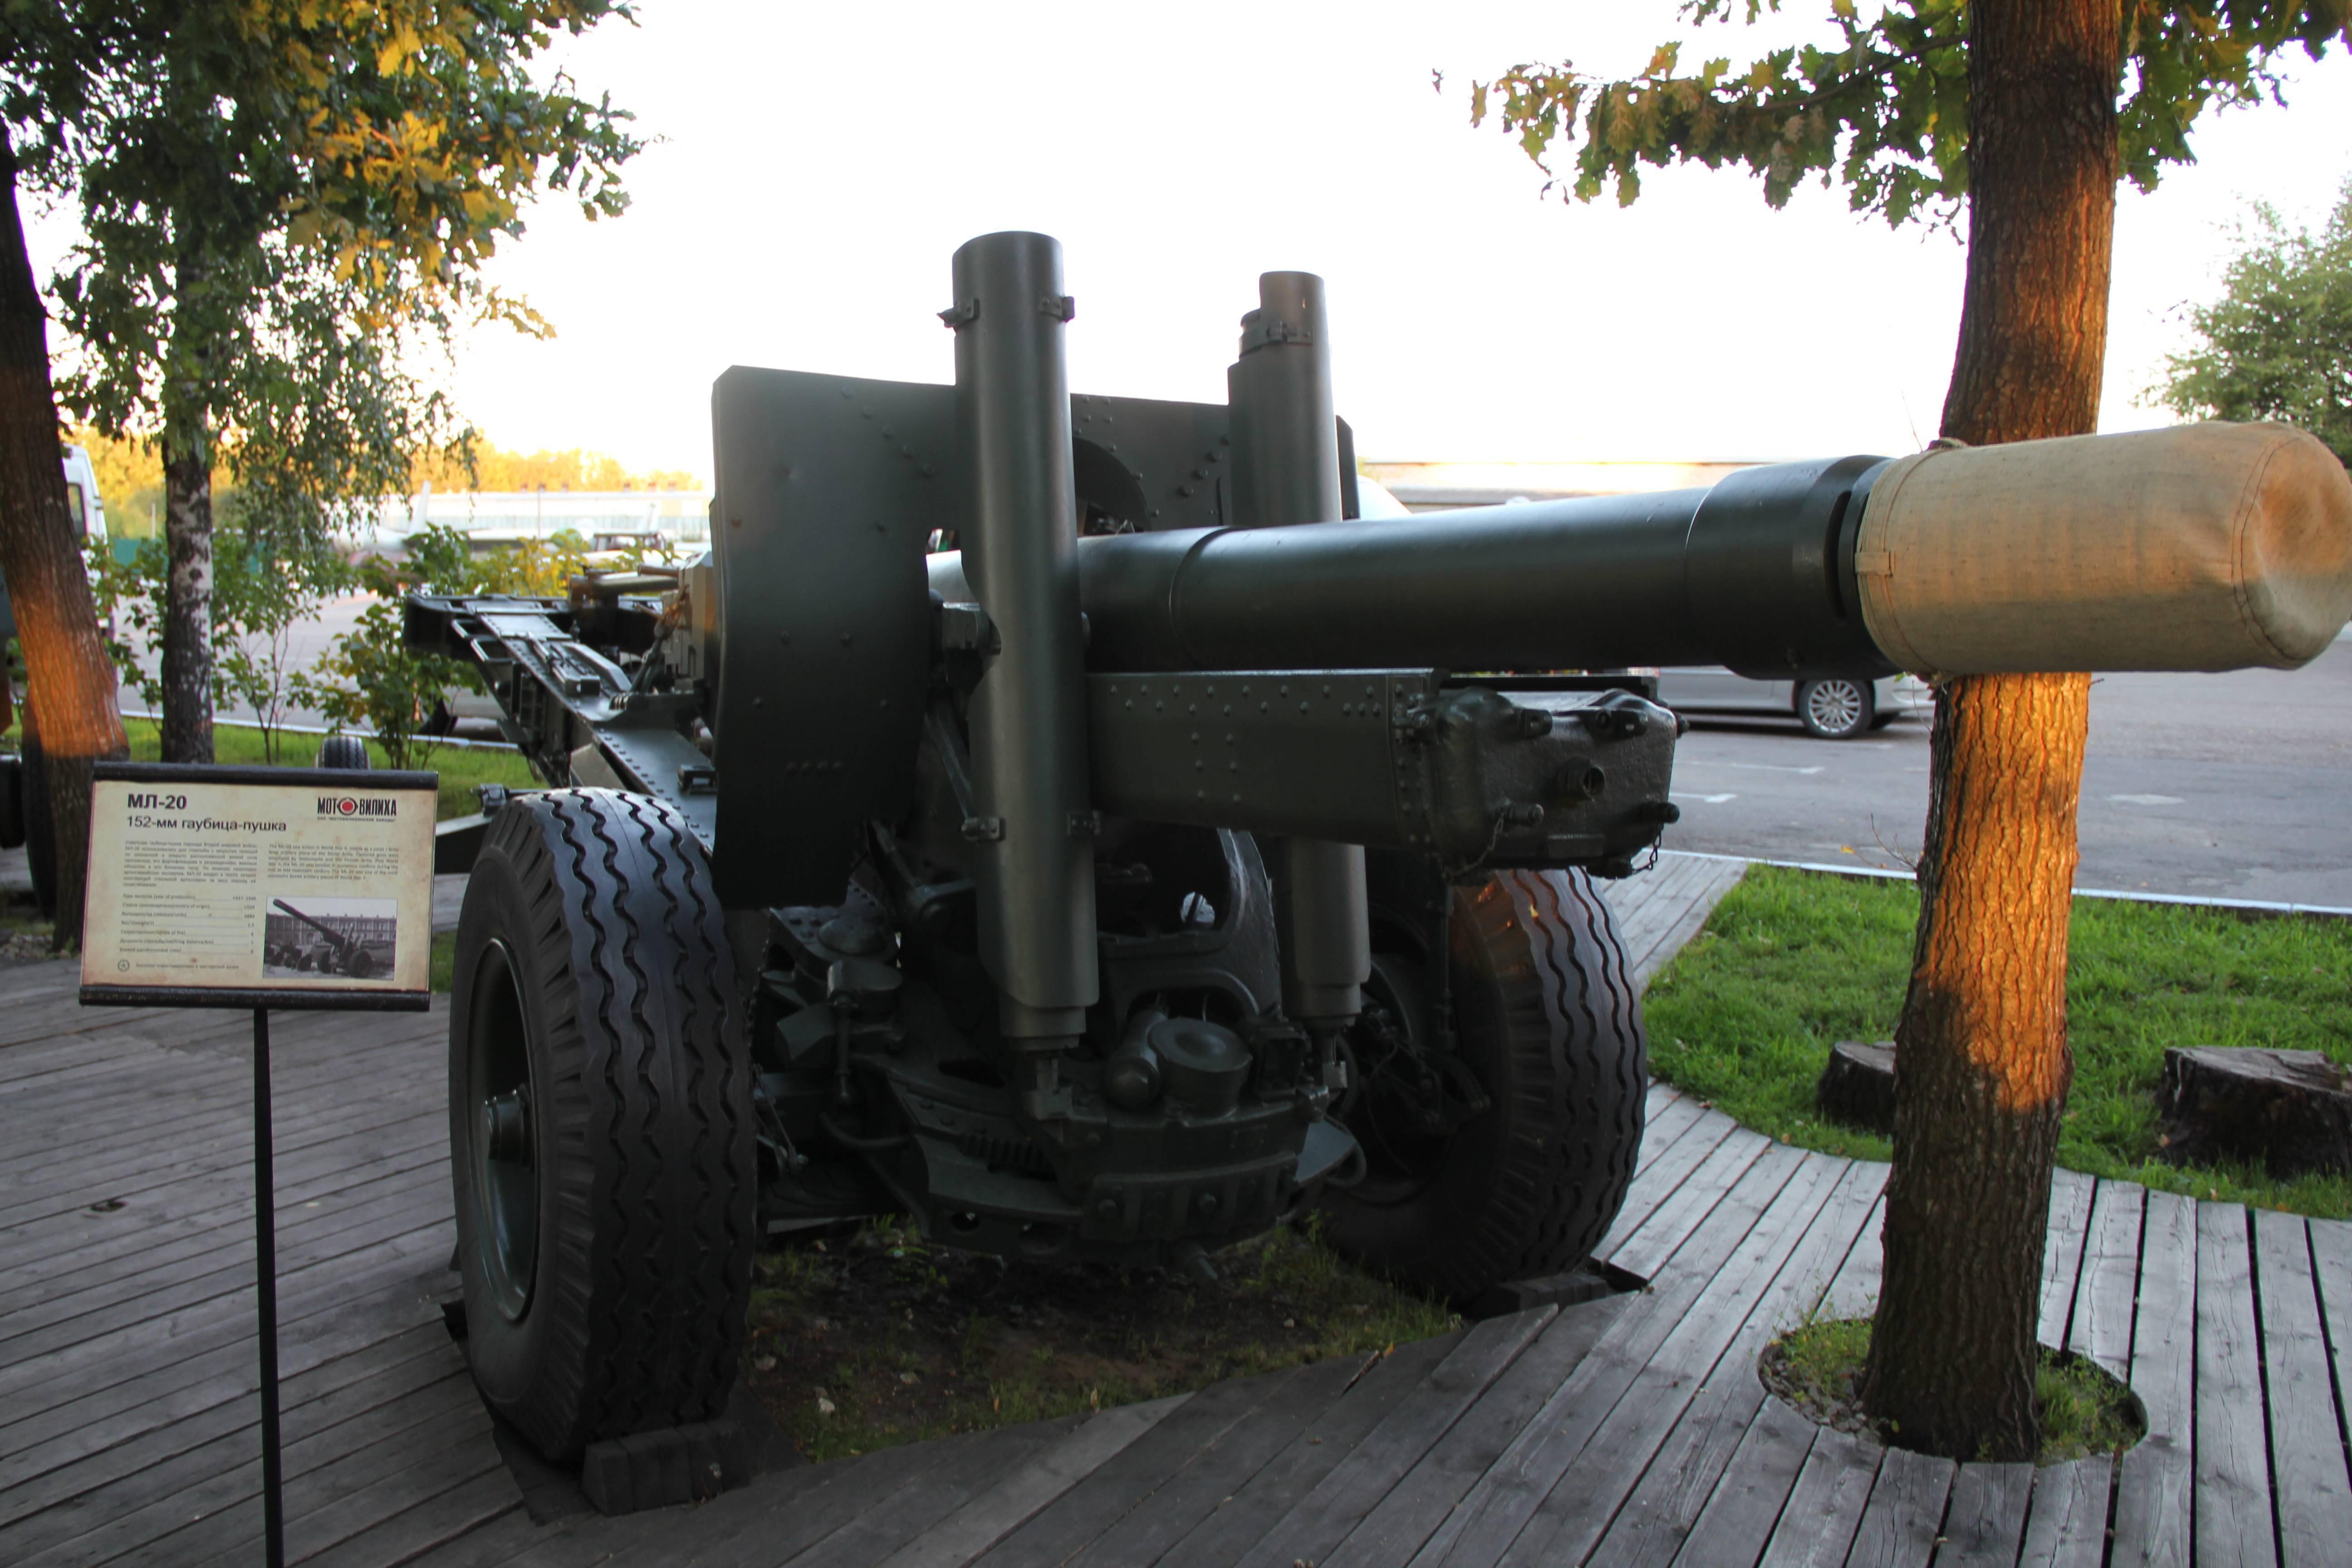 152-мм гаубица-пушка образца 1937 года (мл-20) — armorwiki